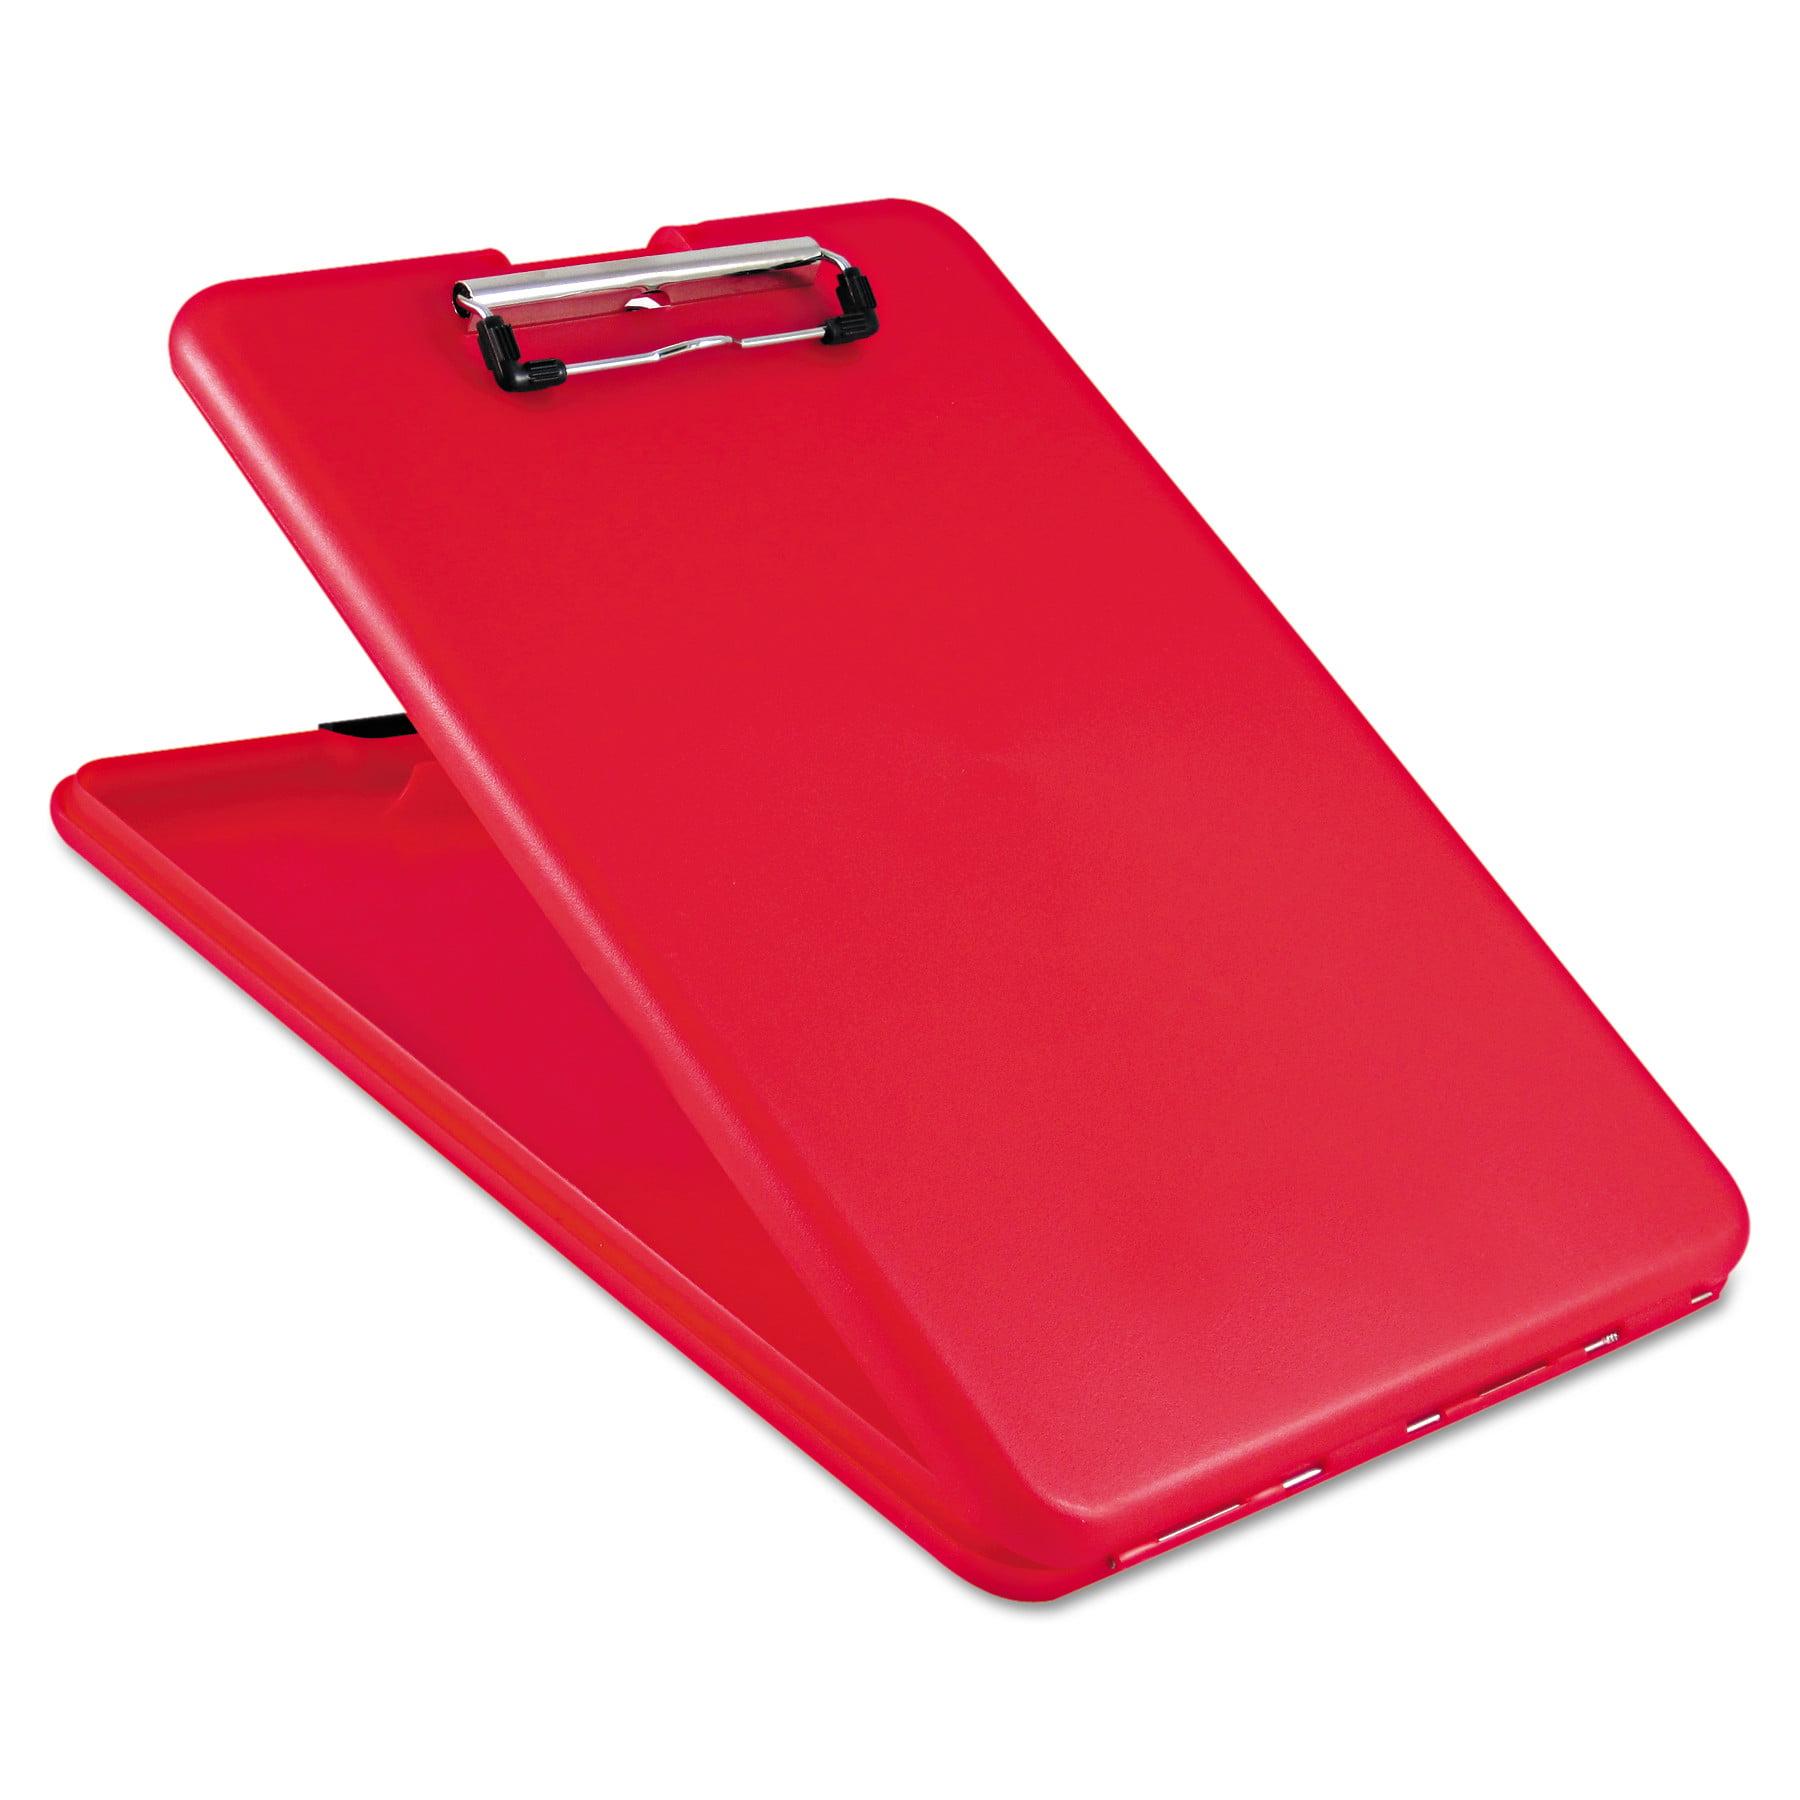 "Saunders SlimMate Storage Clipboard, 1/2"" Clip Cap, 8 1/2 x 11 Sheets, Red -SAU00560"